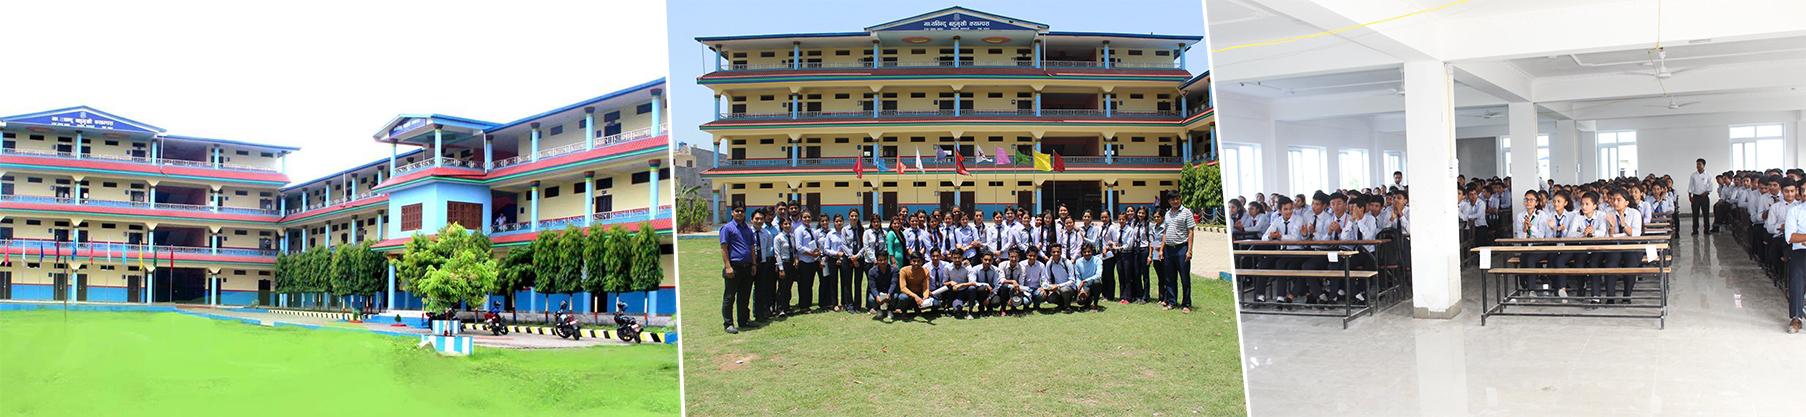 Madhyabindu Multiple Campus